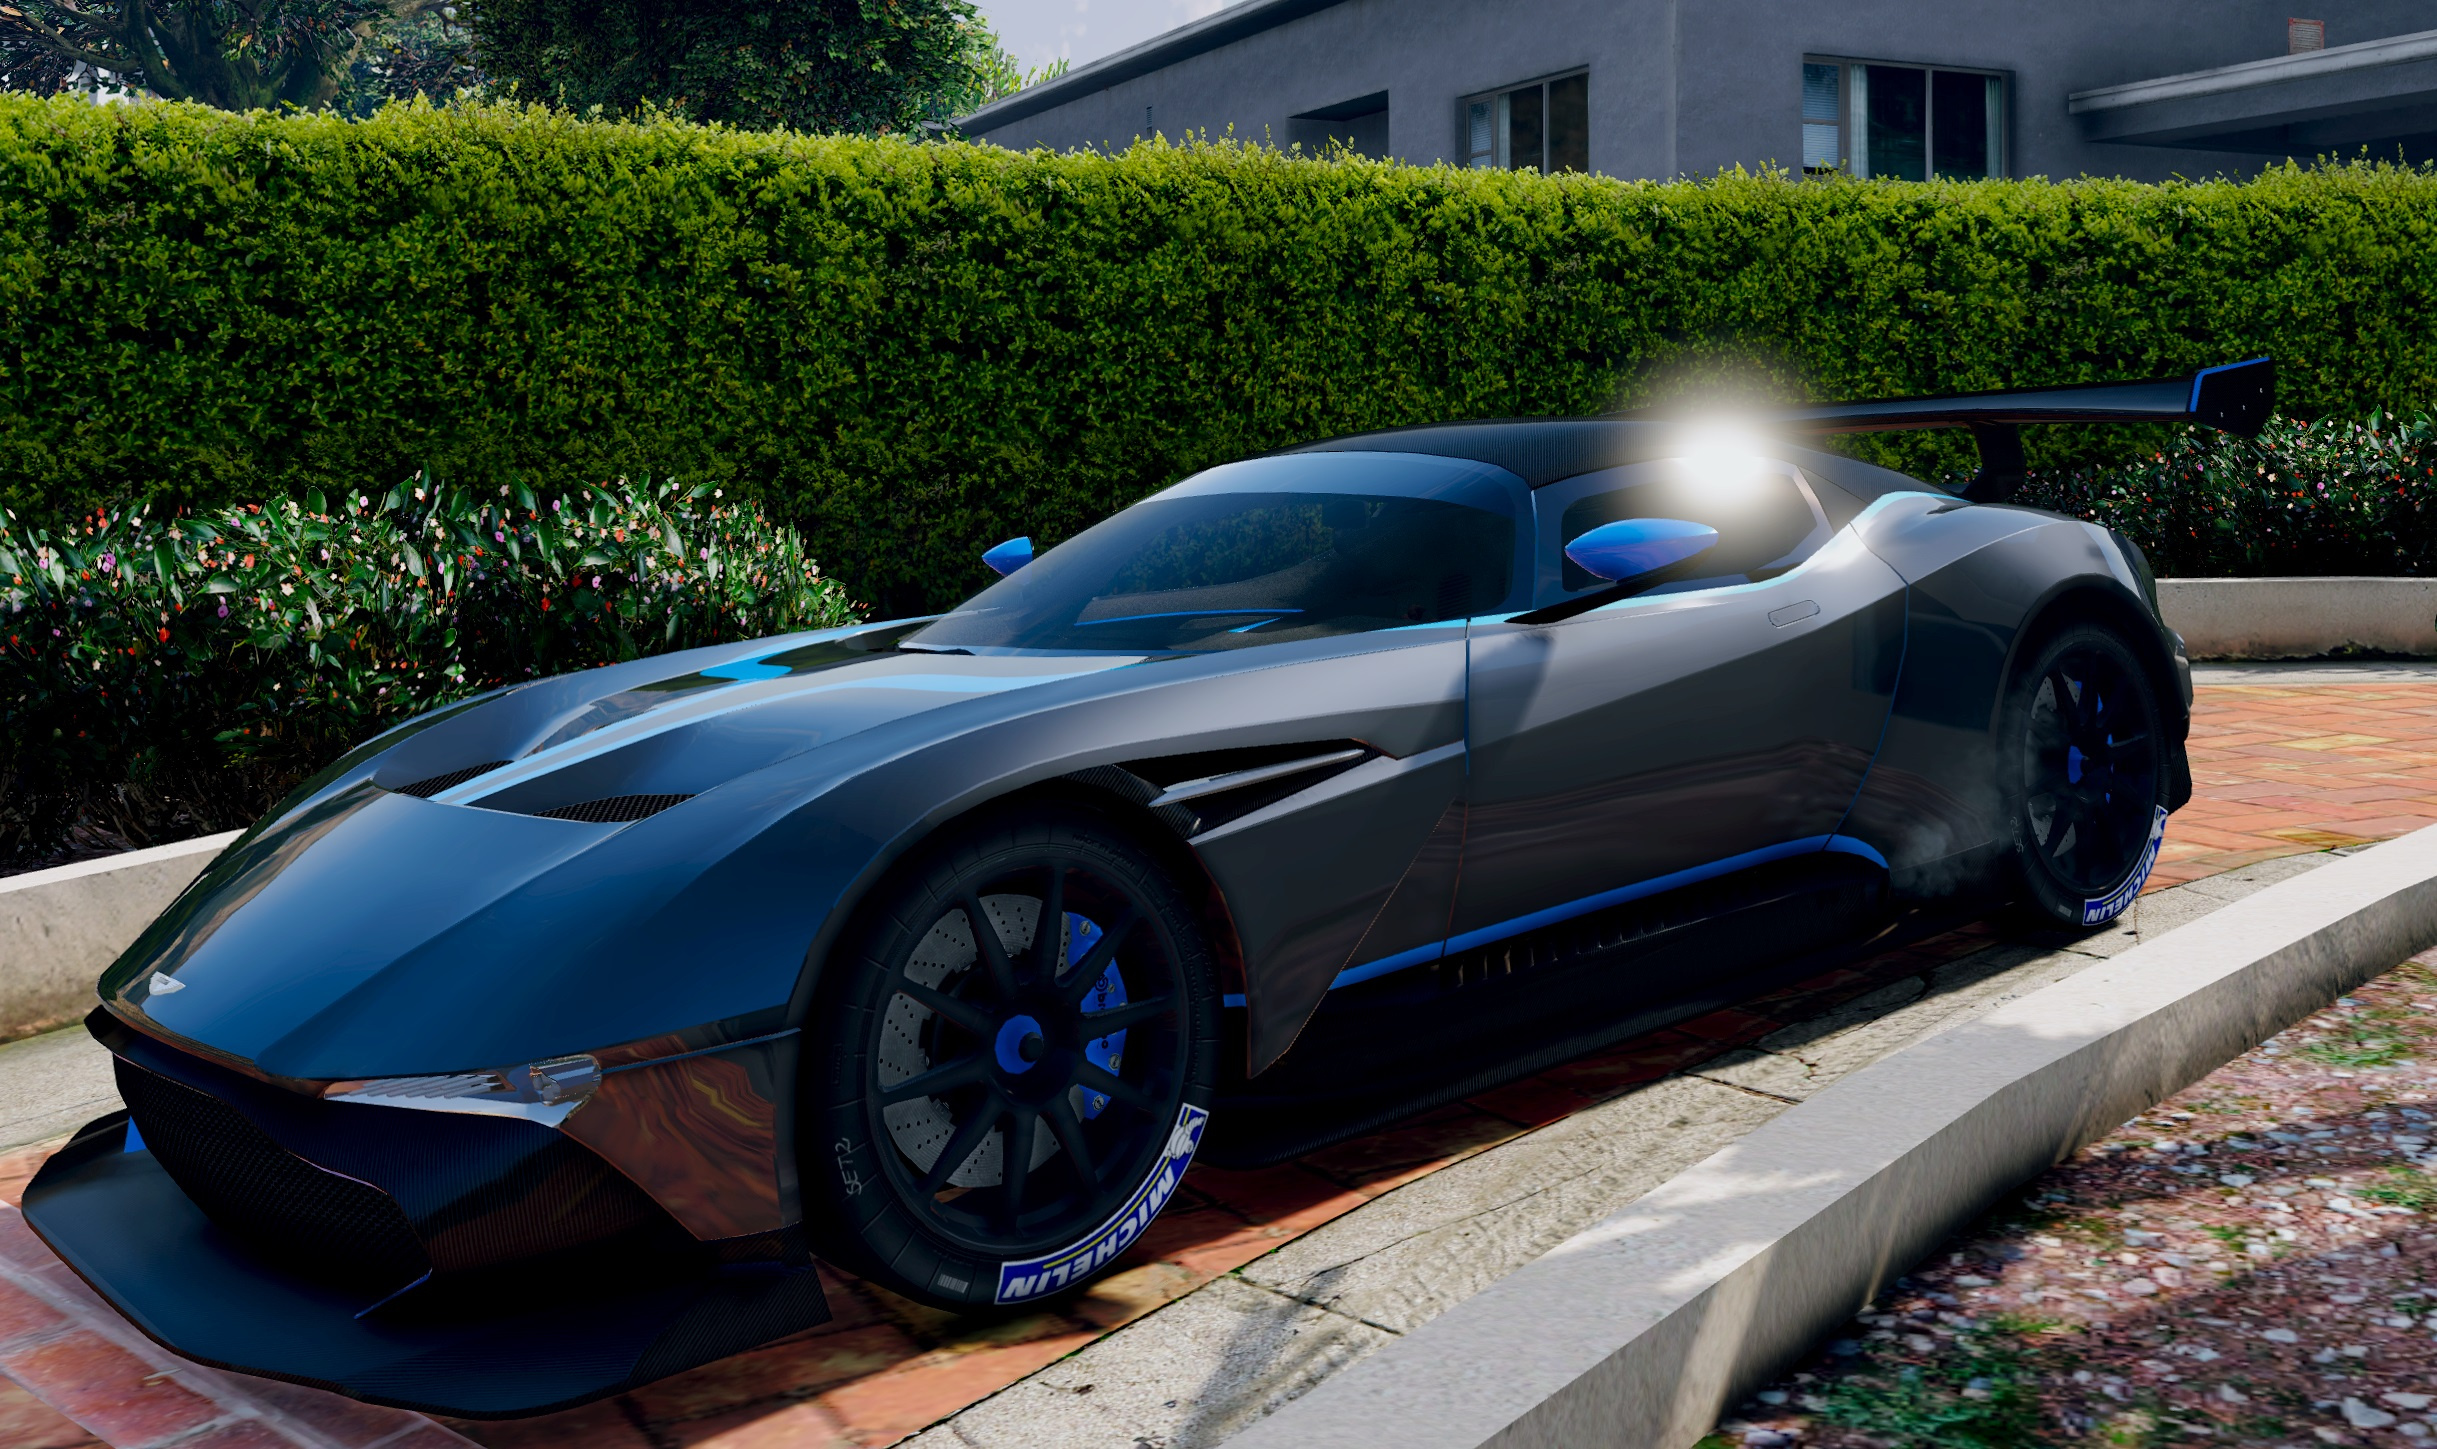 2016 Aston Martin Vulcan Gta5 Mods Com